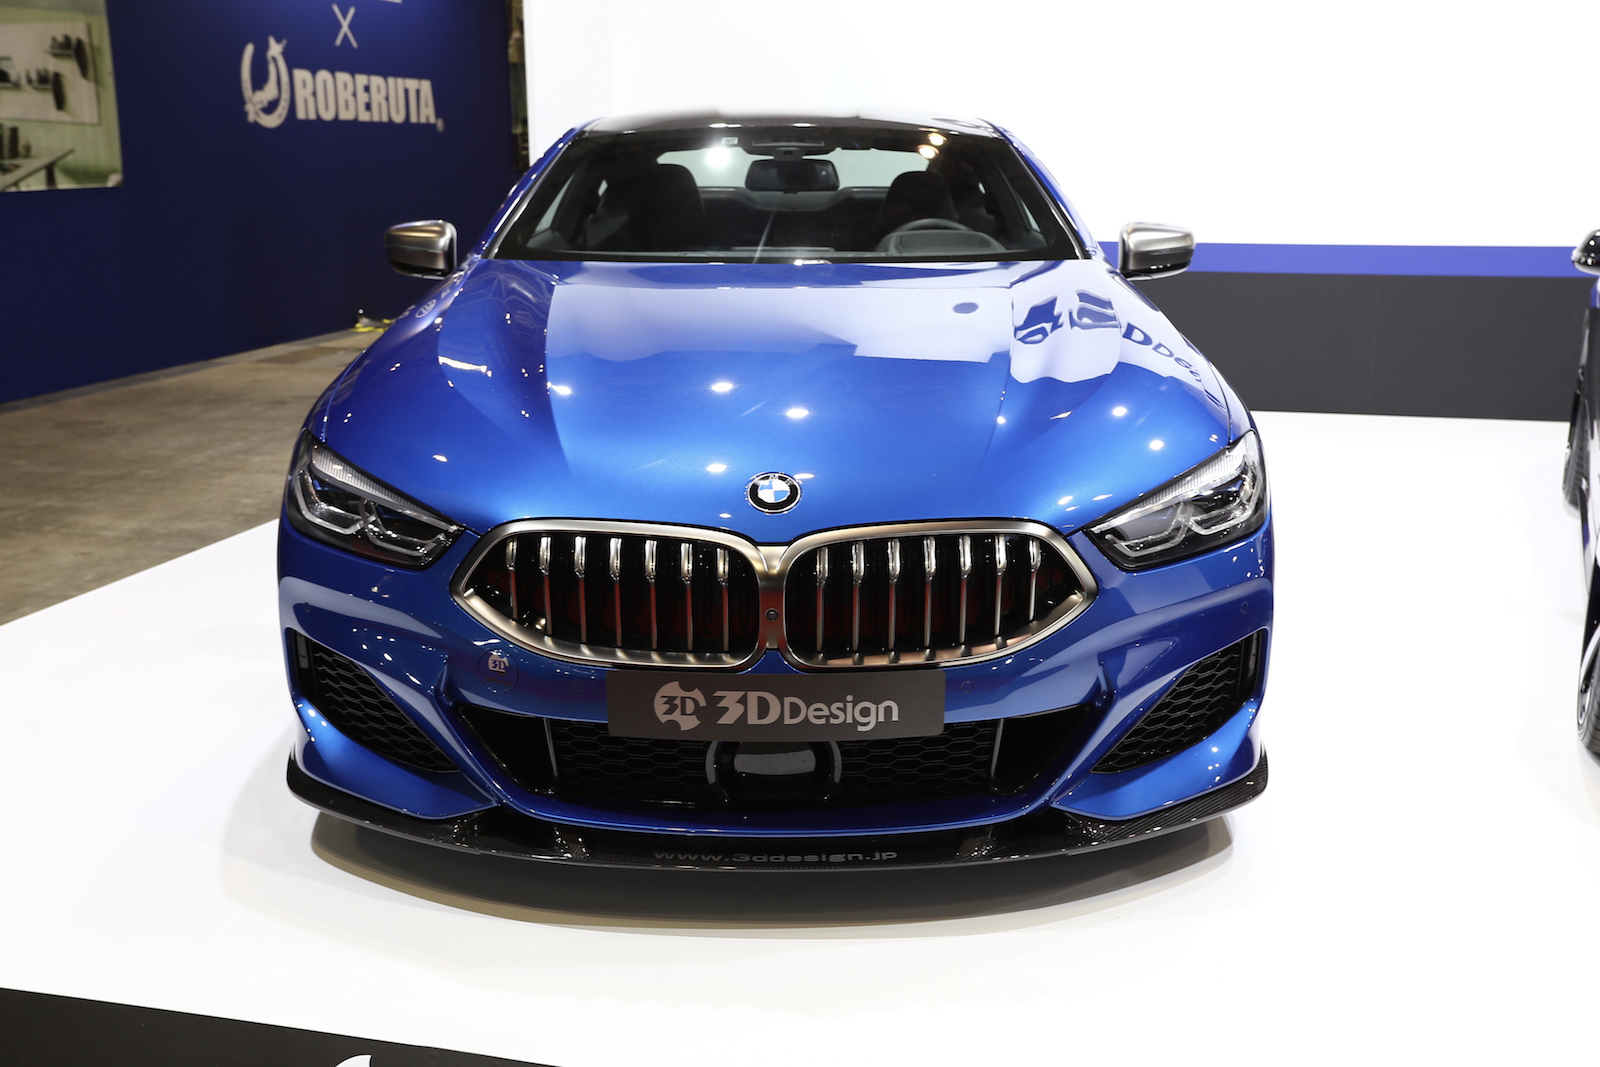 BMW M850i 3D Design BMW Z4 5